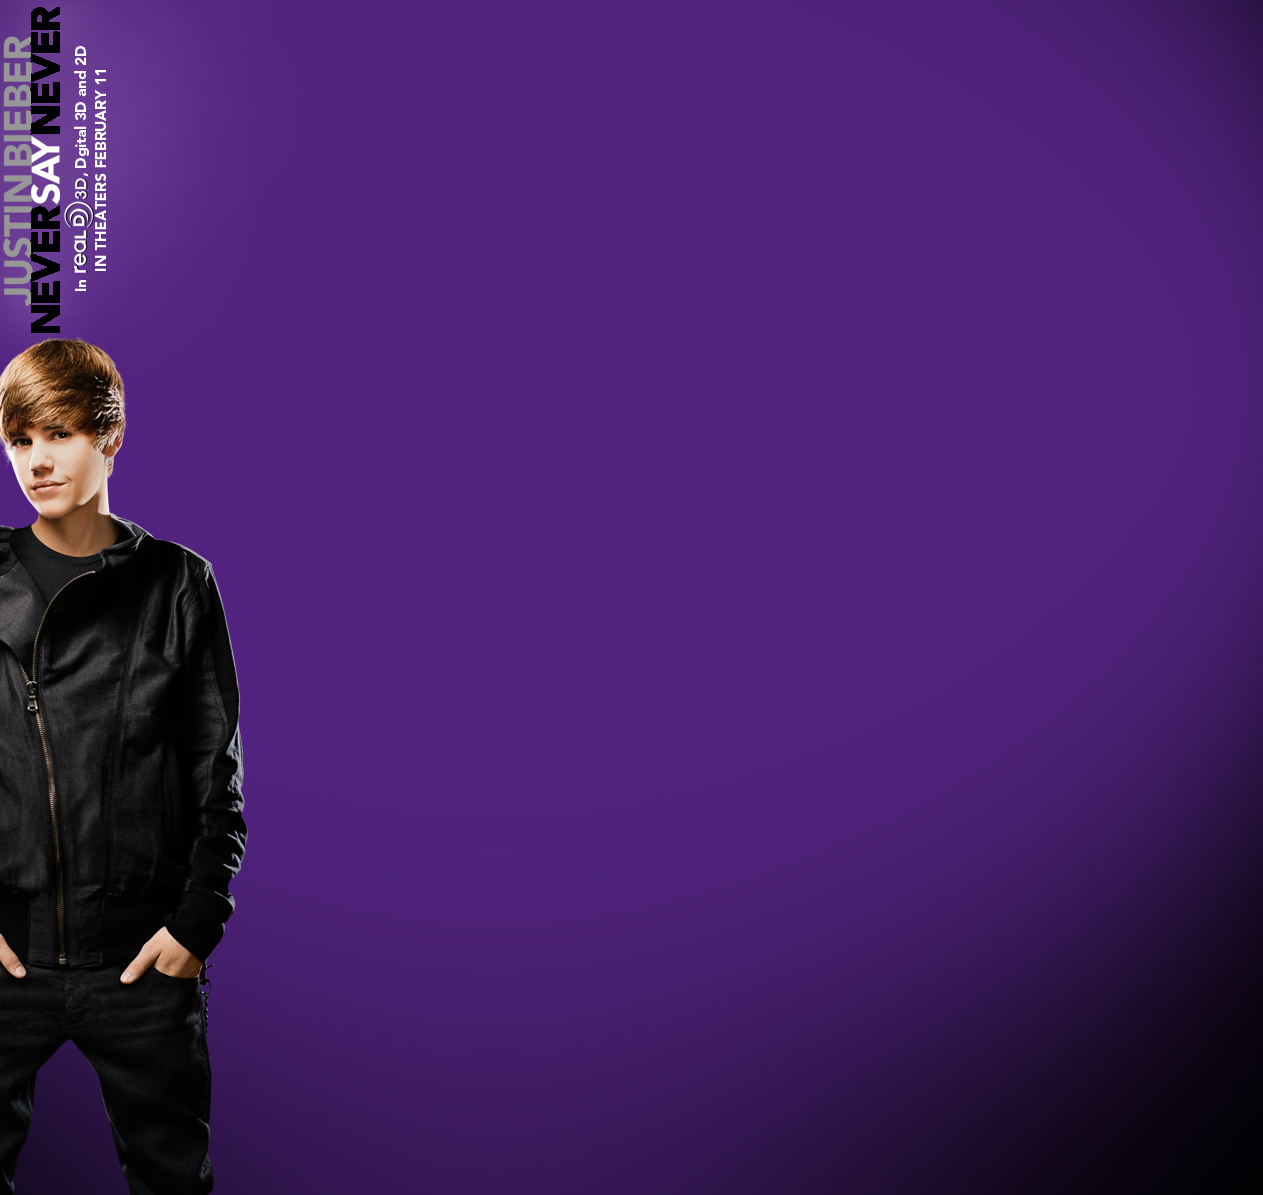 http://1.bp.blogspot.com/-7pISebVeRy0/Tbof411AF4I/AAAAAAAADXE/iJ43Knb5qaU/s1600/Justin_Bieber_purple_Backgrounds.jpg